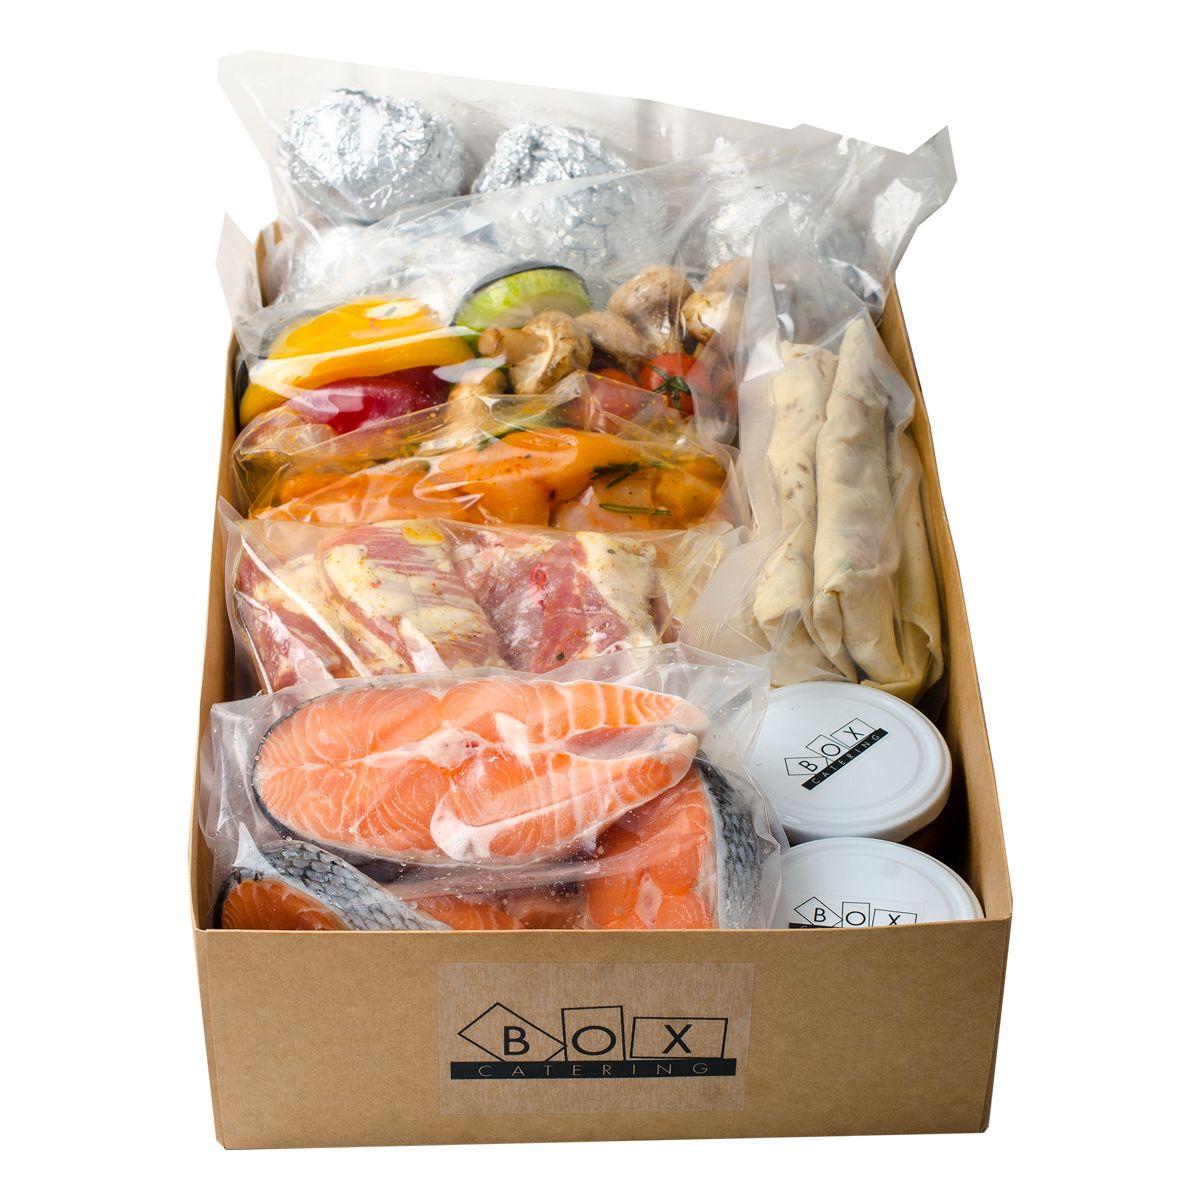 Picnic meat & fish big box фото 1